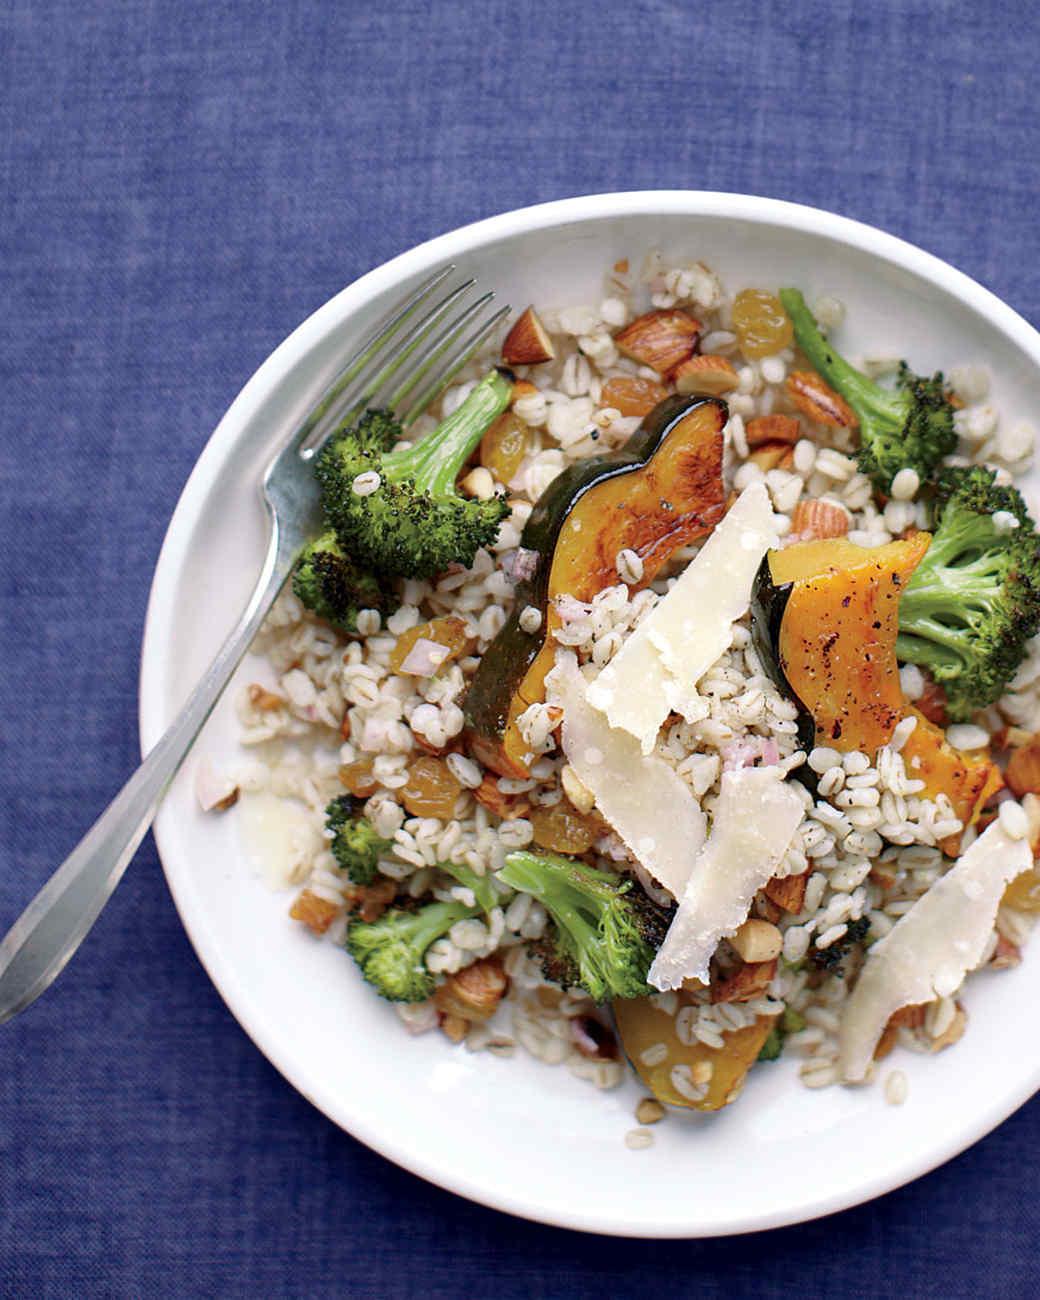 barley-squash-broccoli-salad-med107918.jpg